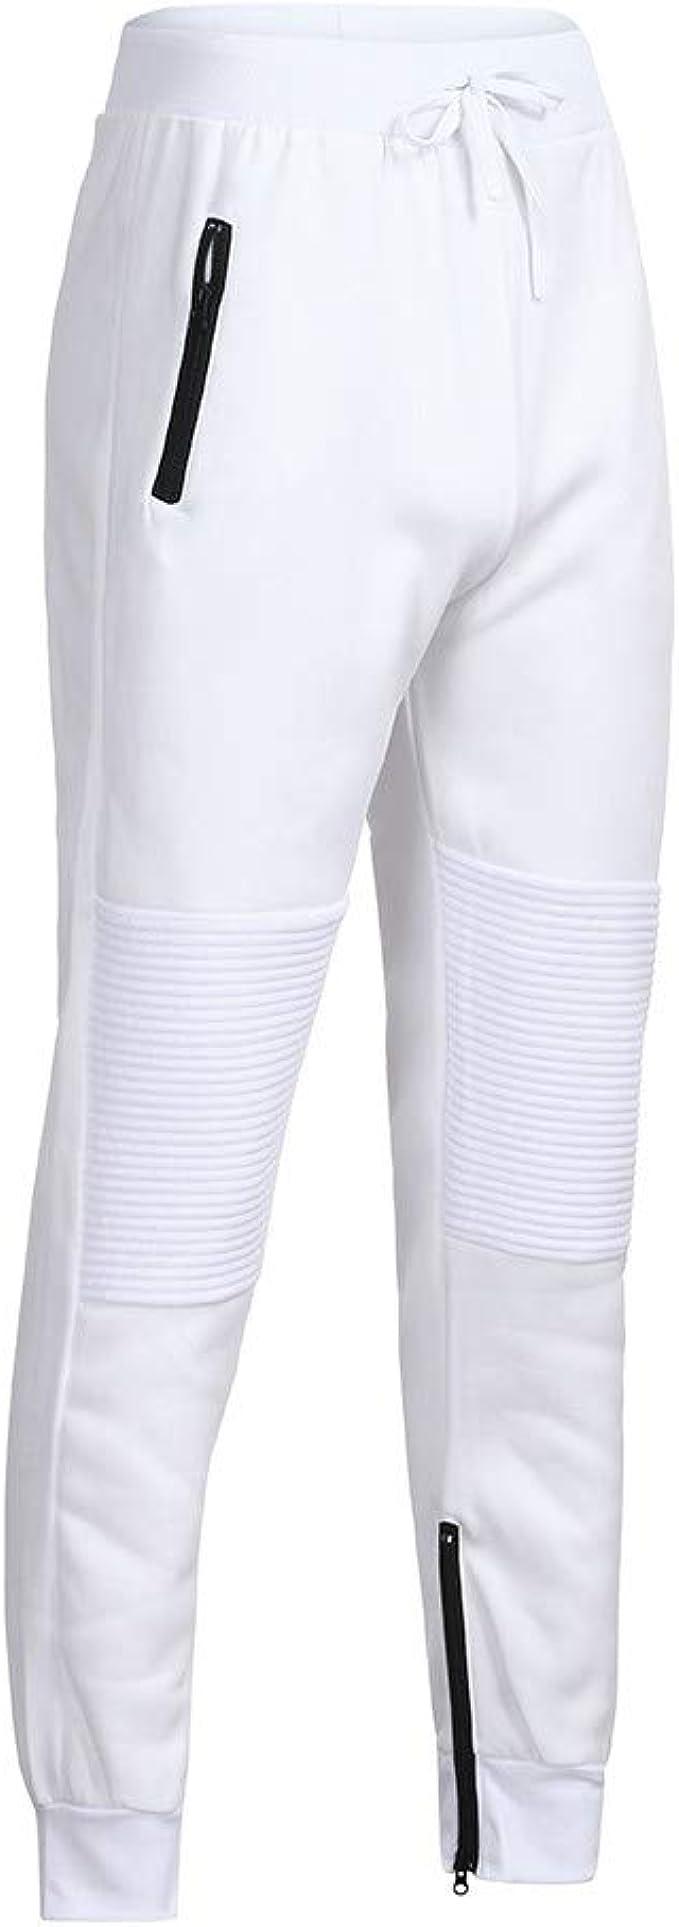 Pantalón Chandal Hombre Pantalones Deportivos Casual con Cordones ...